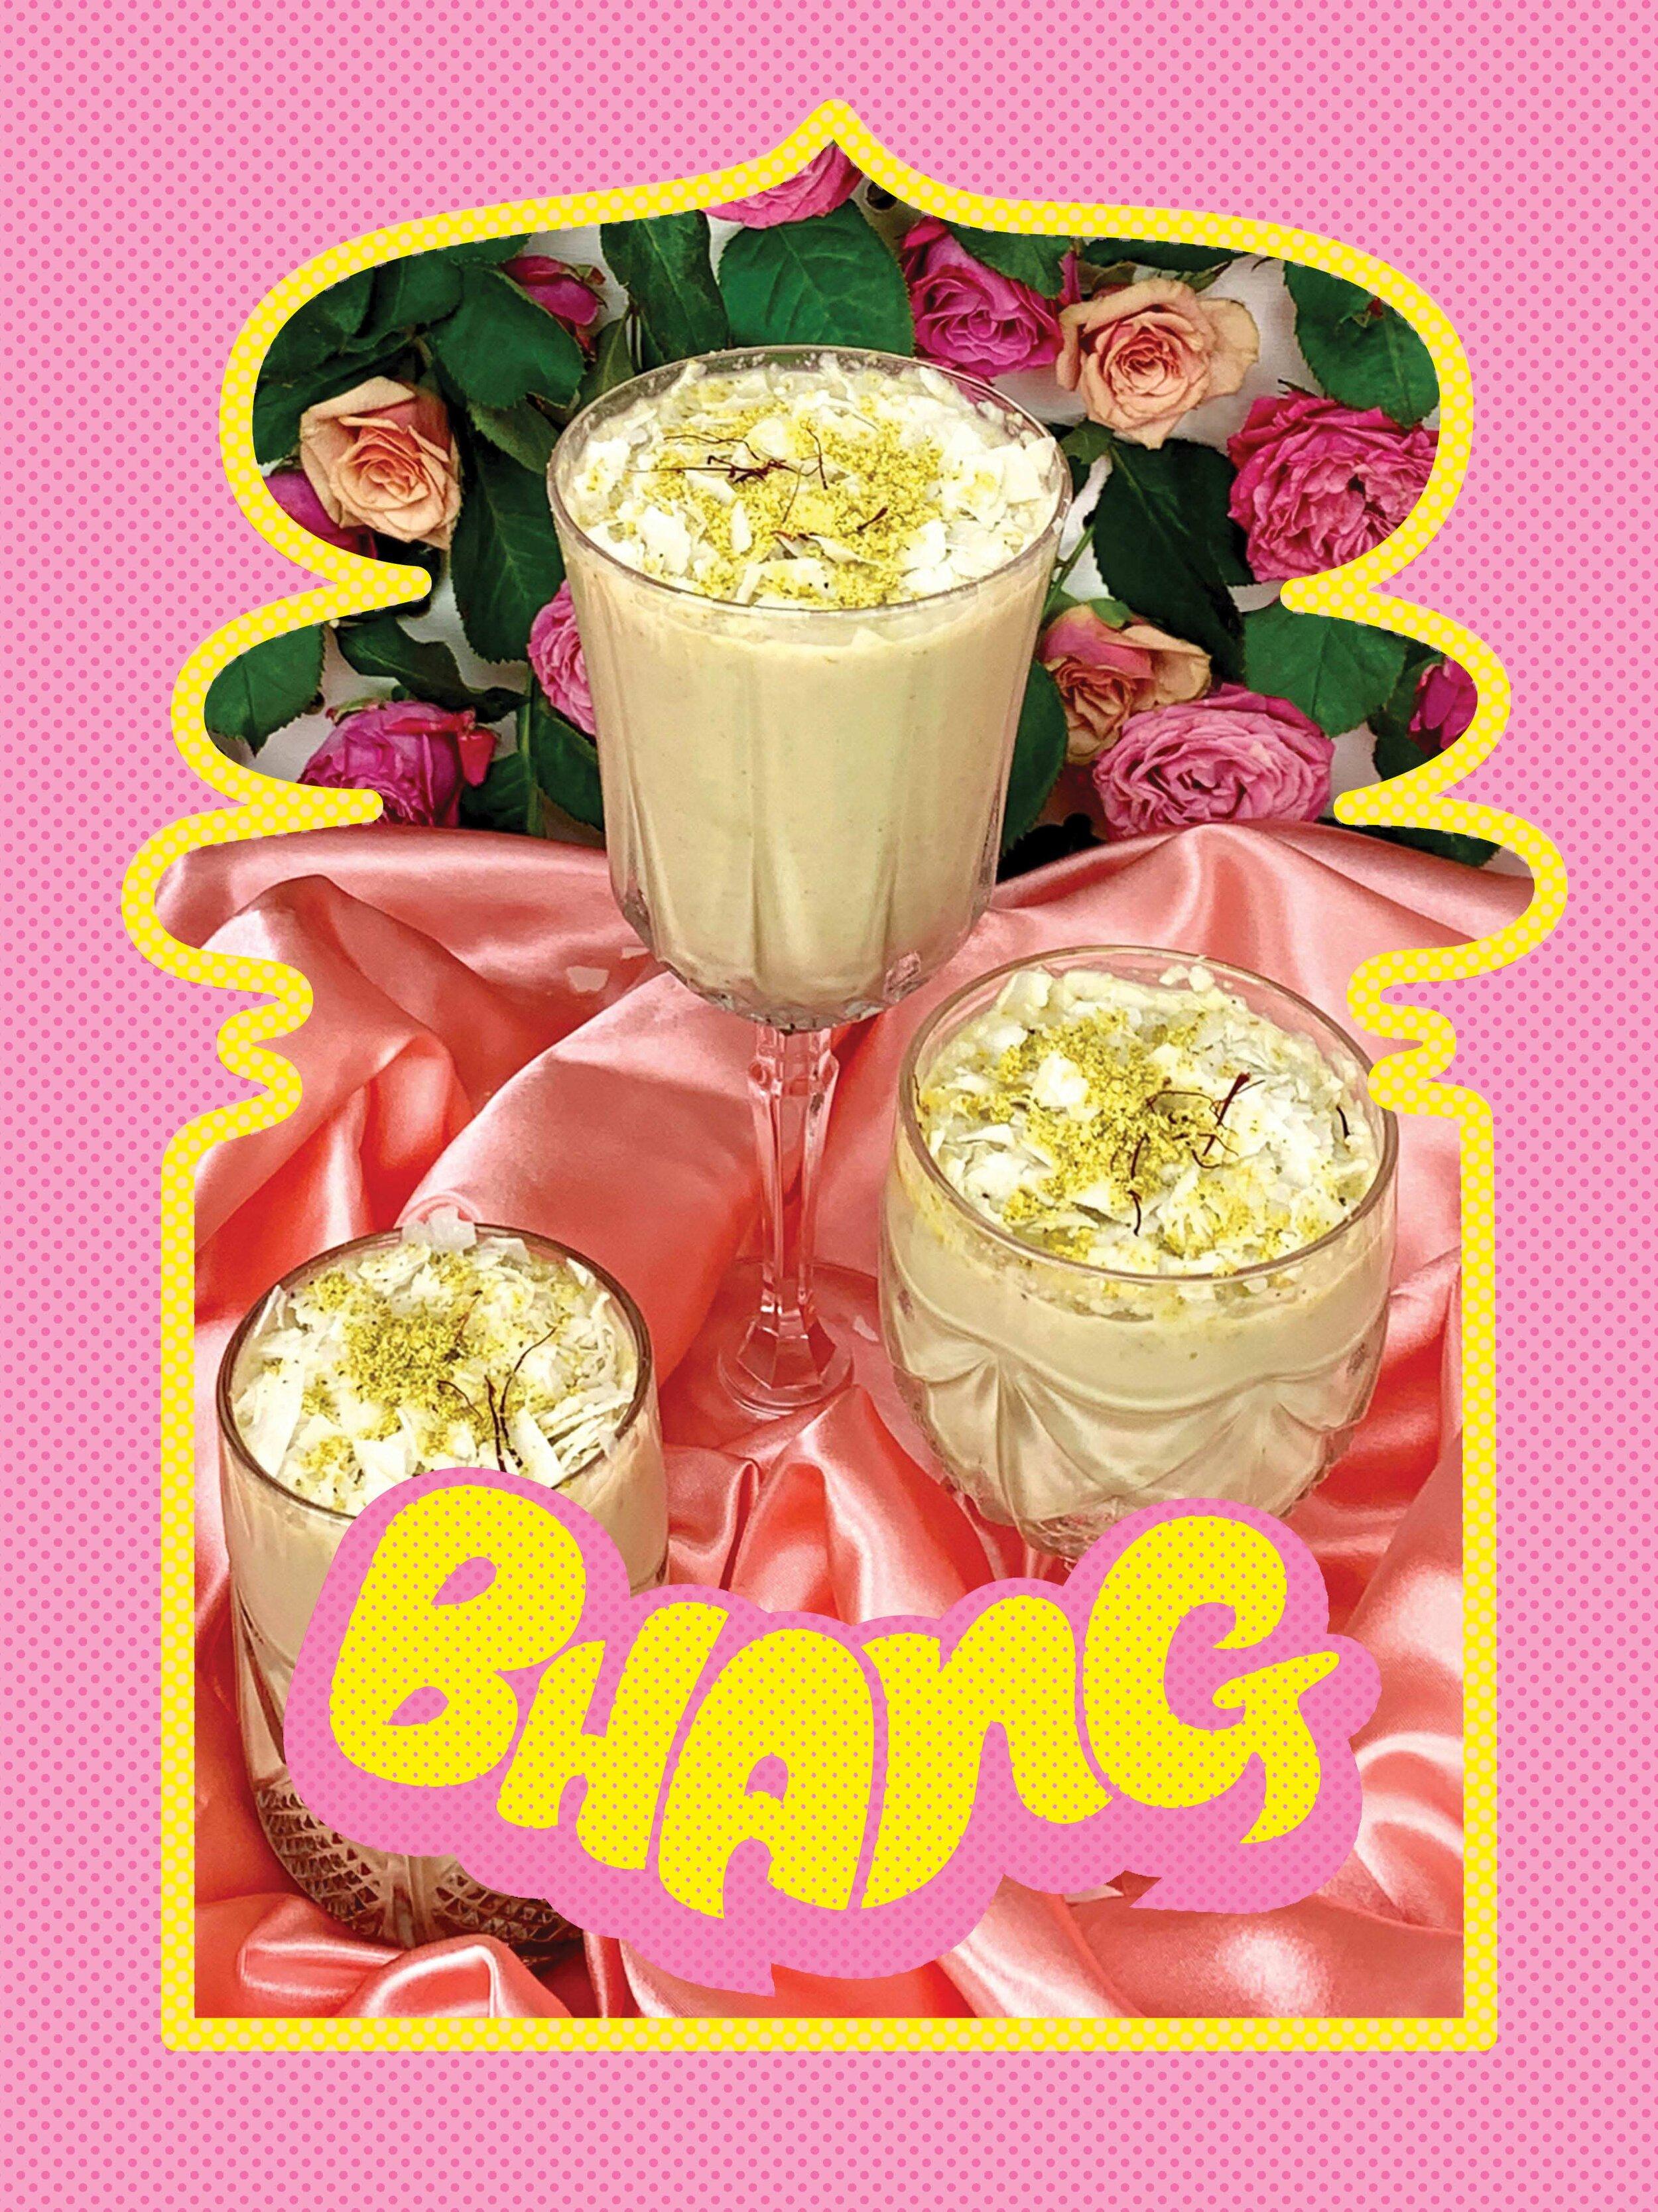 bhang_poster_web.jpg